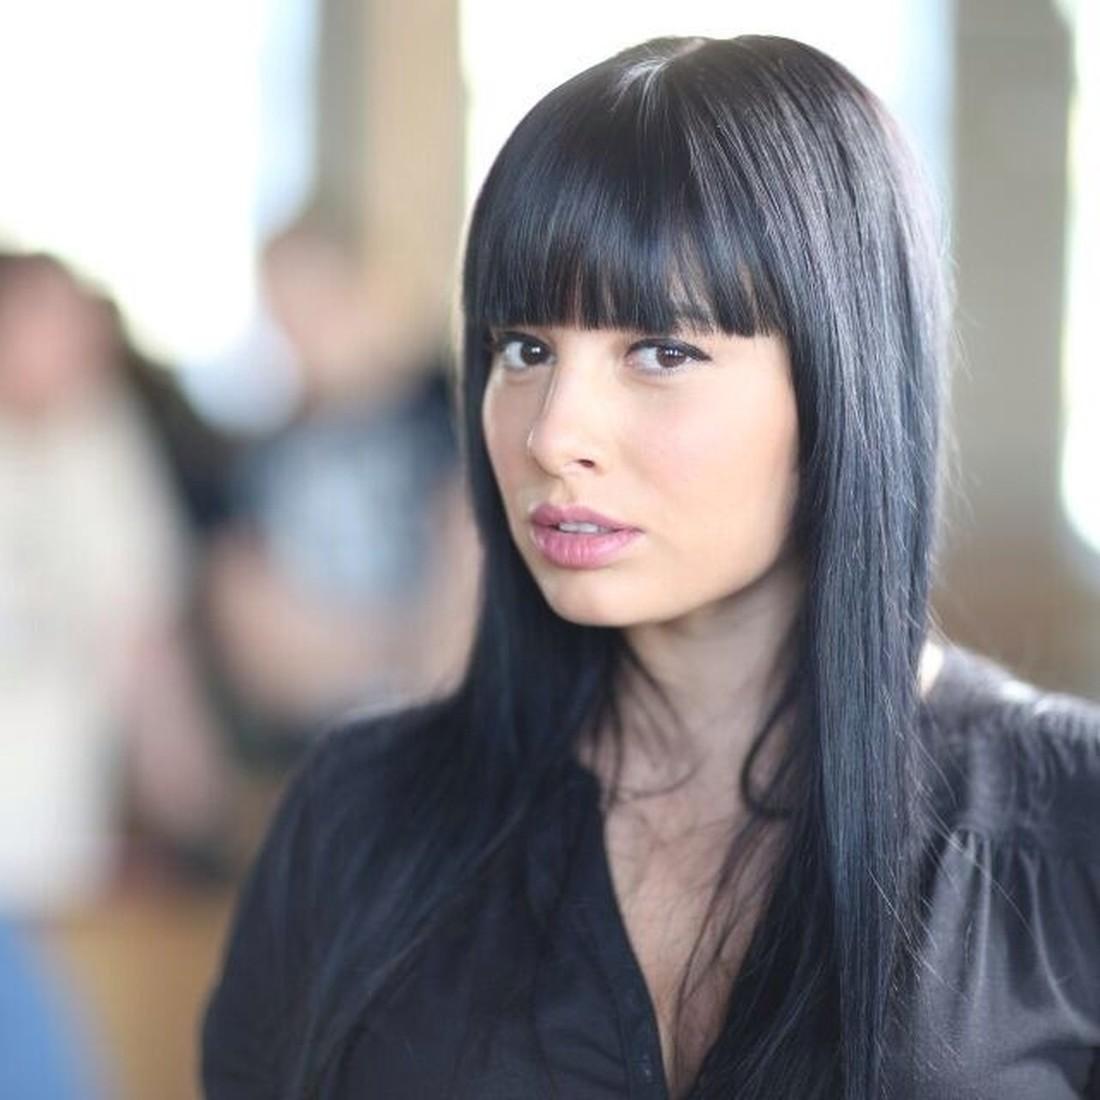 Нелли Ермолаева скорбит об уходе родного человека